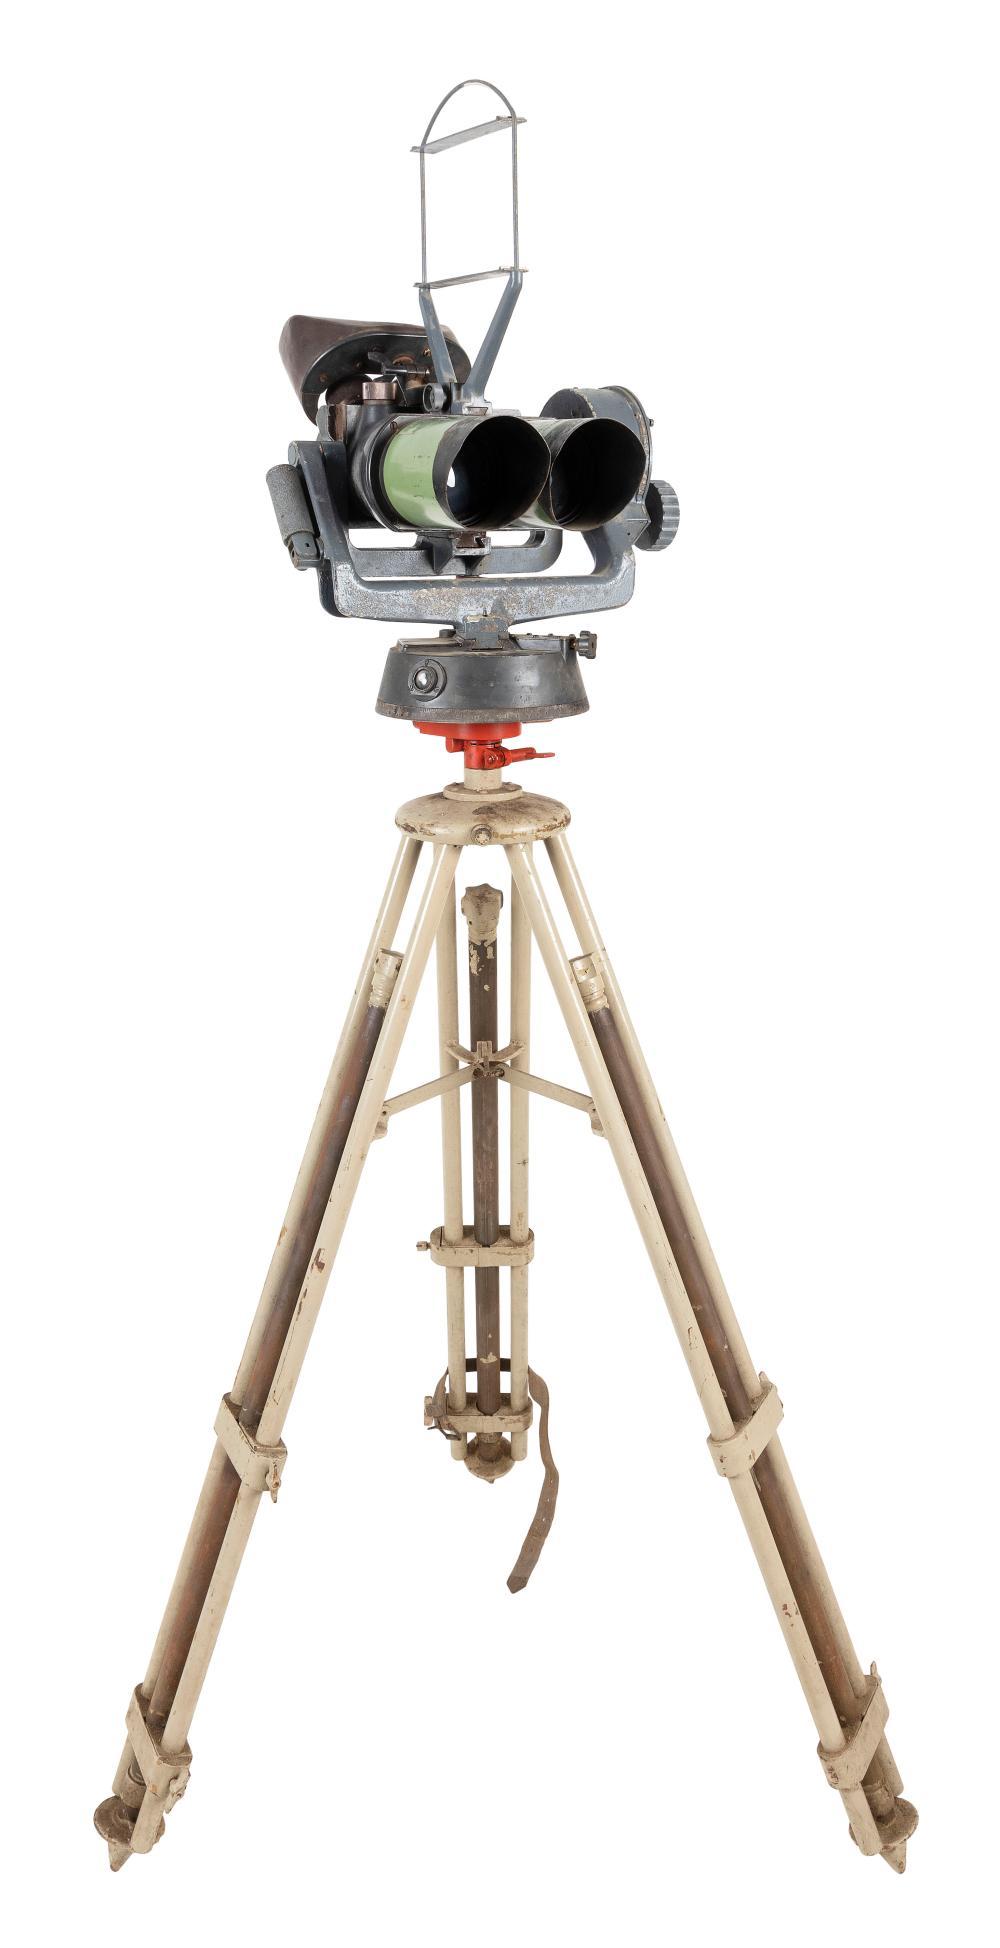 "GERMAN FLAK ARTILLERY BINOCULARS AND TRIPOD WITH CASE World War II-Era Tripod height 49"". Length of binoculars 11""."